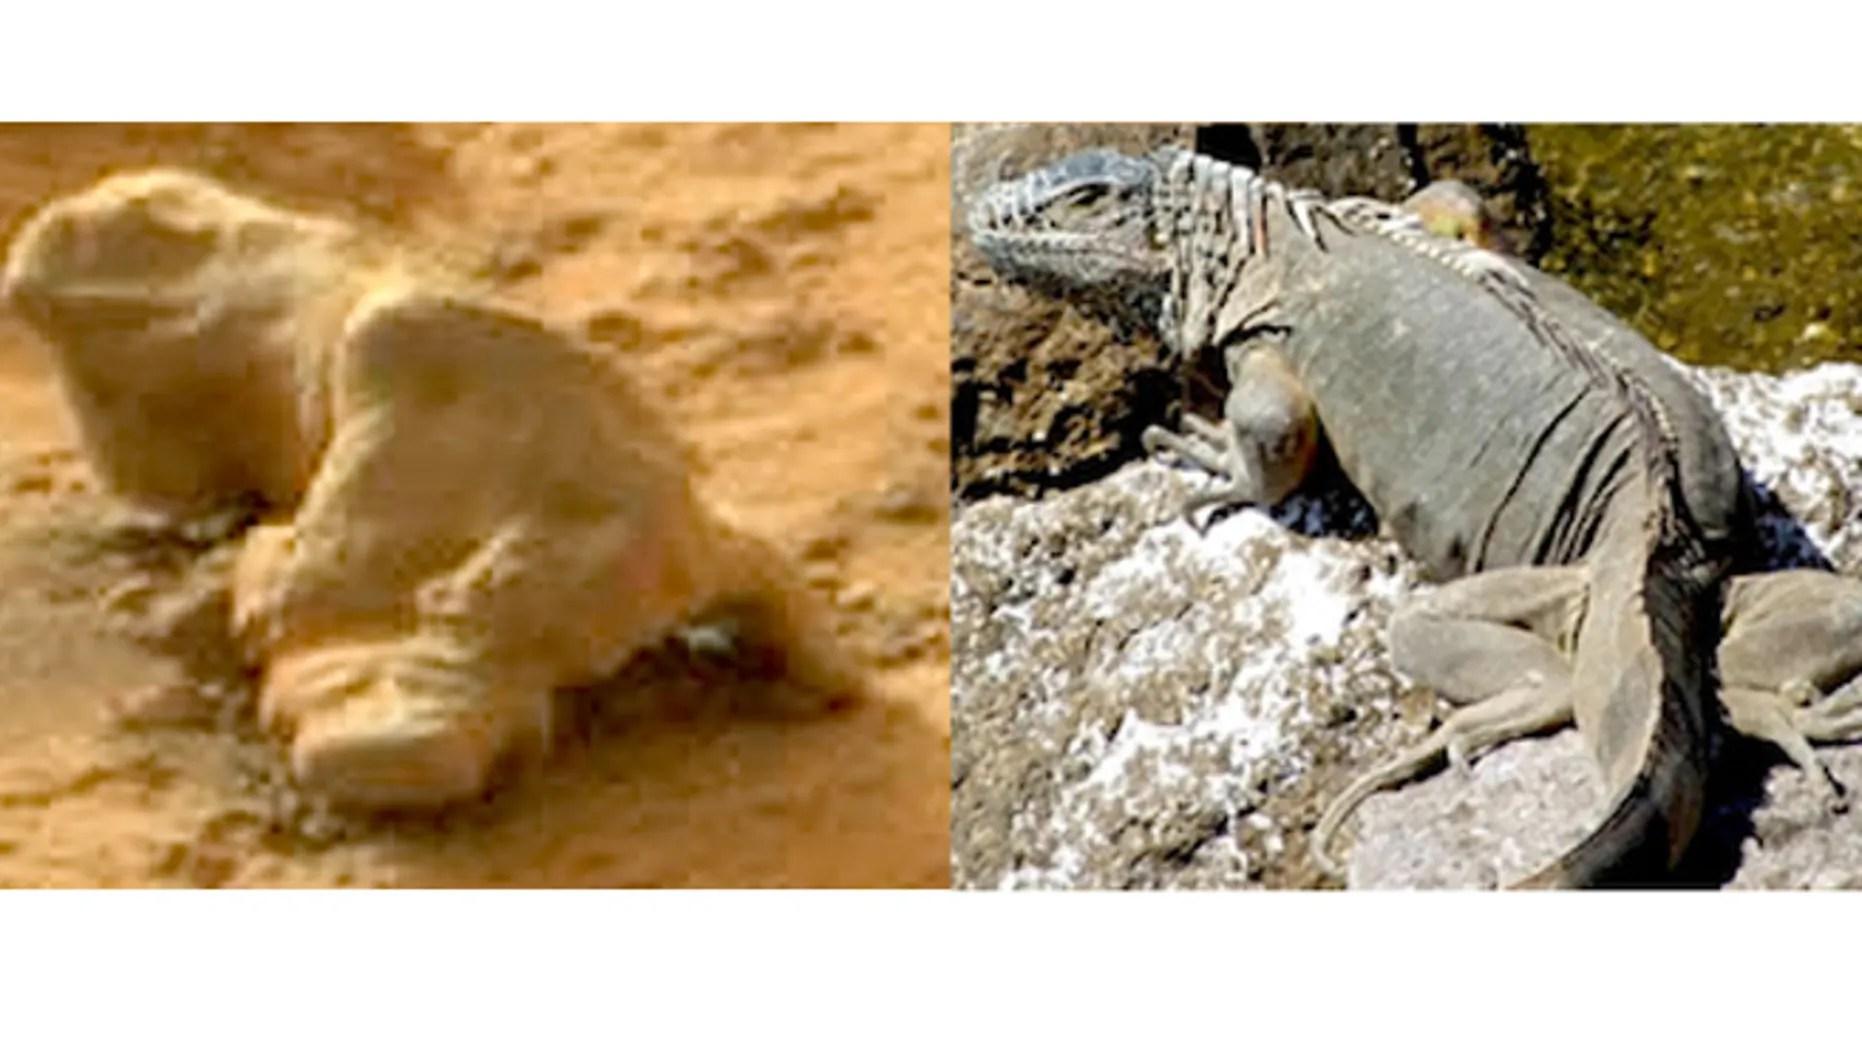 NASA Curiosity Rover spots iguana on Mars   Fox News